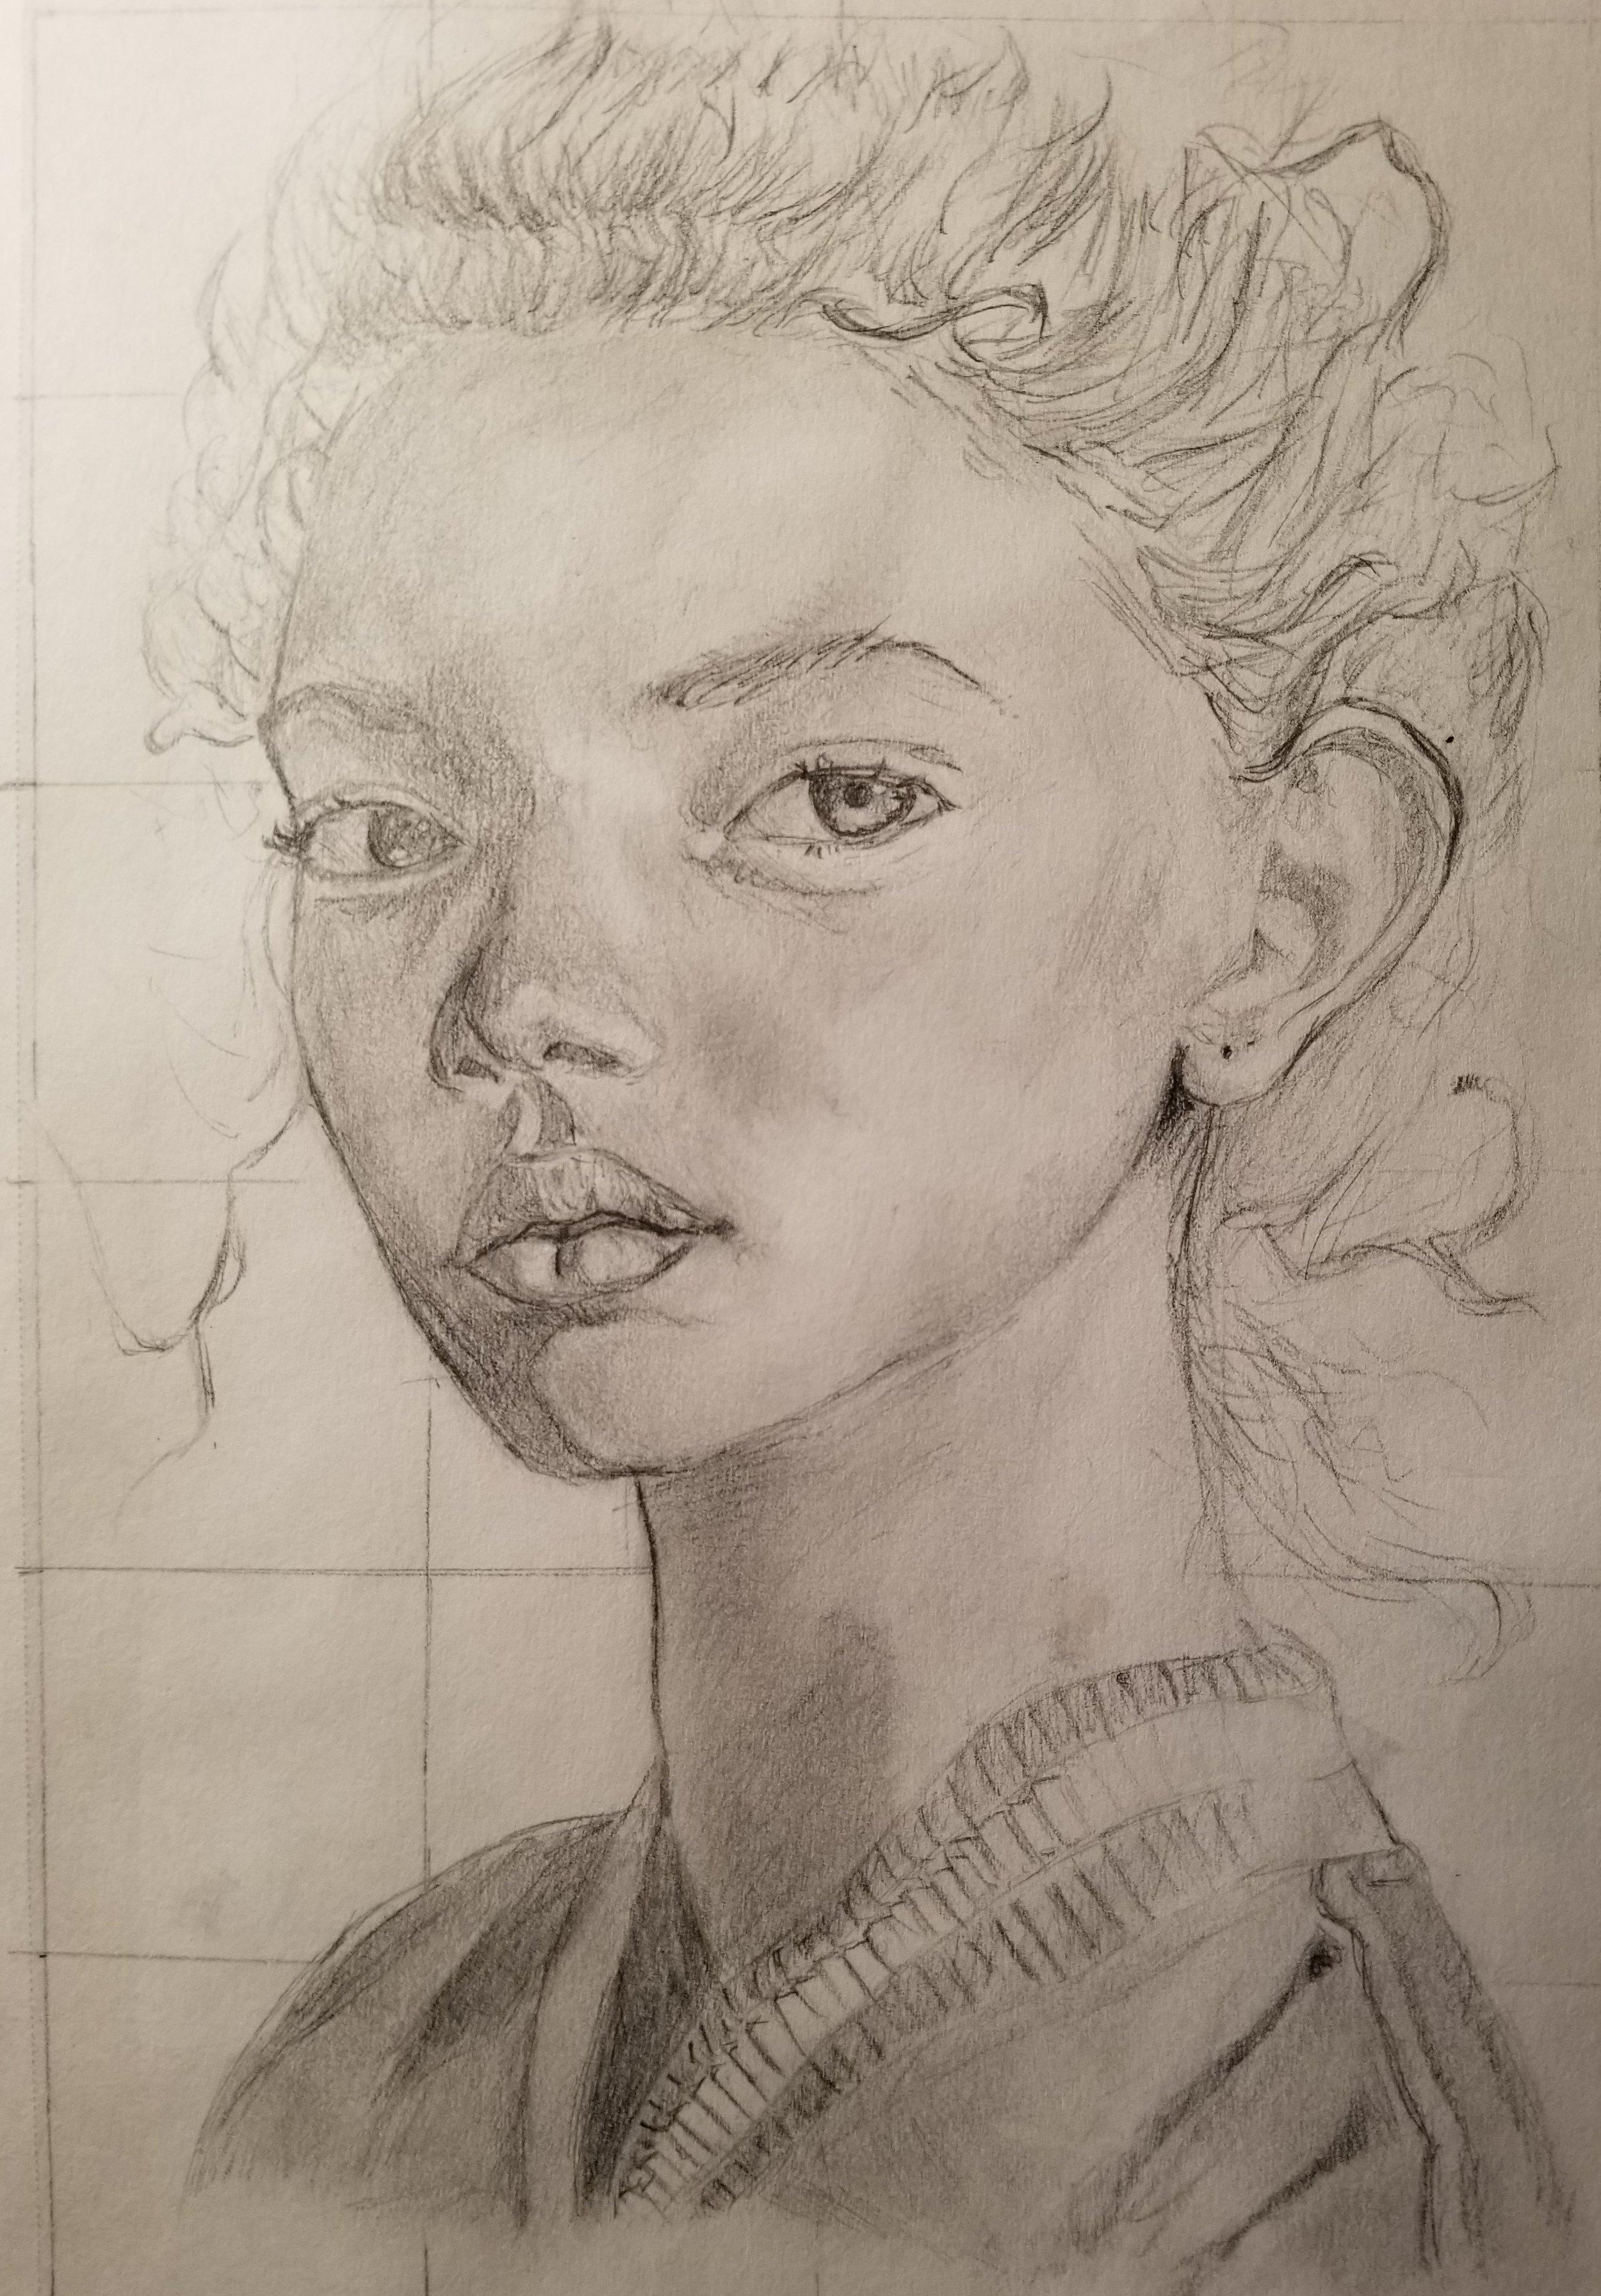 Media type: Pencil drawing